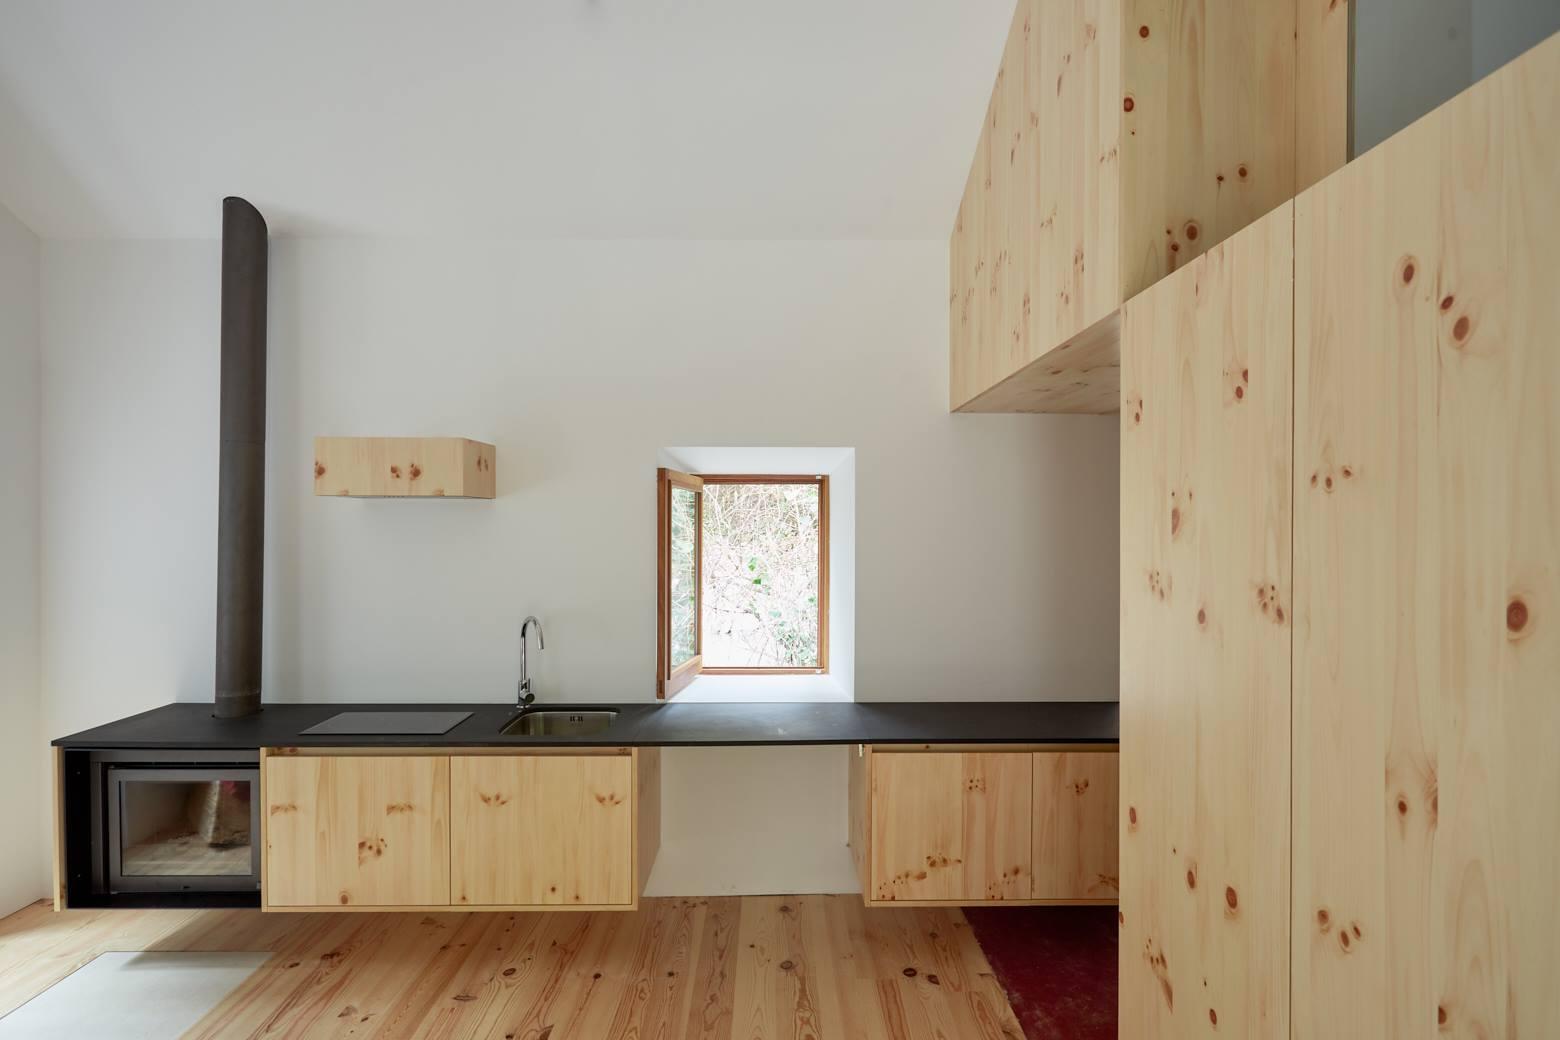 Architecture_Bruno_Lucas_Dias_Watermill_on_the_Crag_13